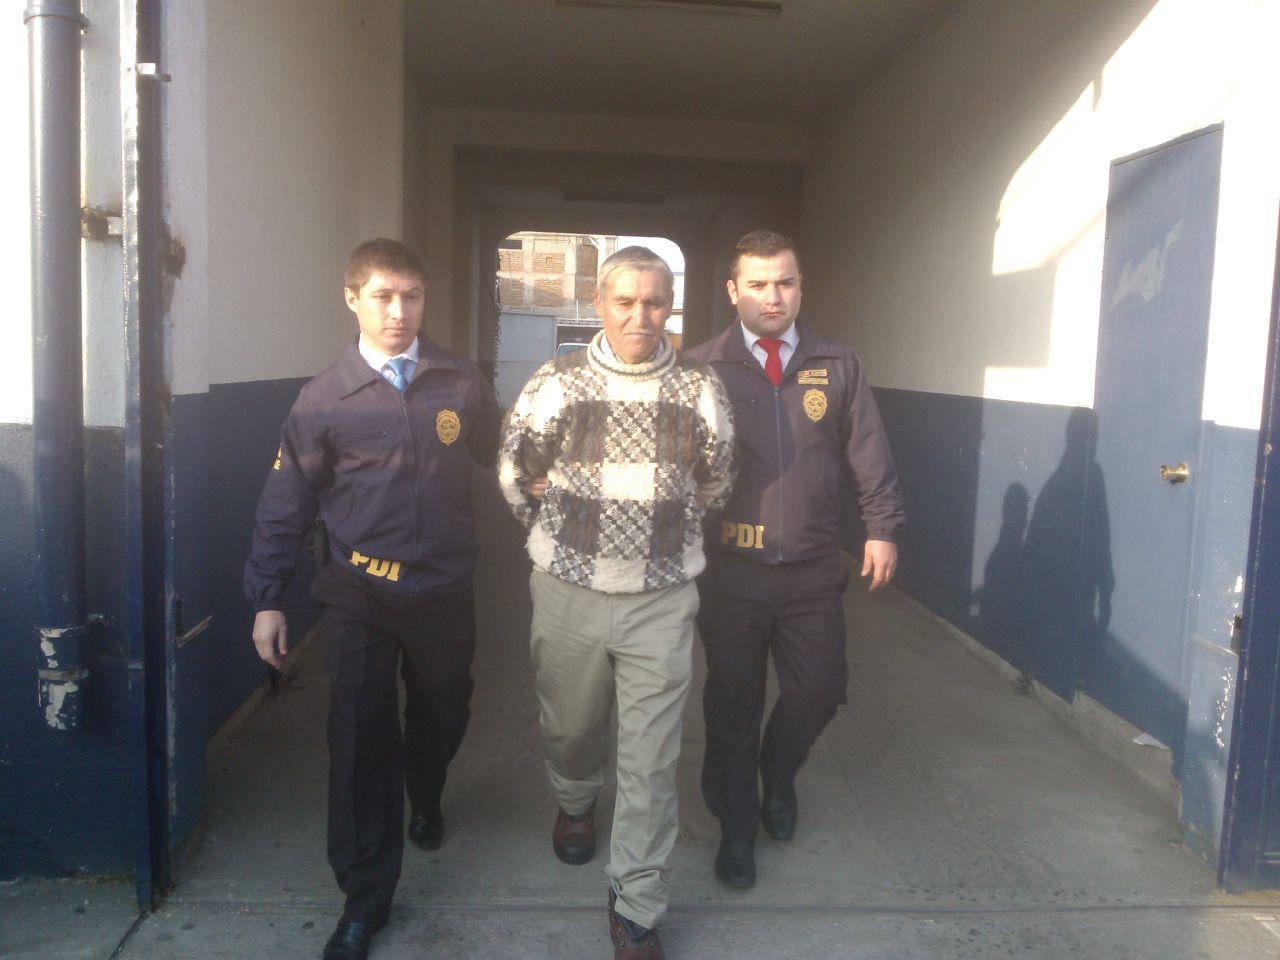 Detienen a peligroso antisocial que el 2010 se fugó de la Cárcel en Talca